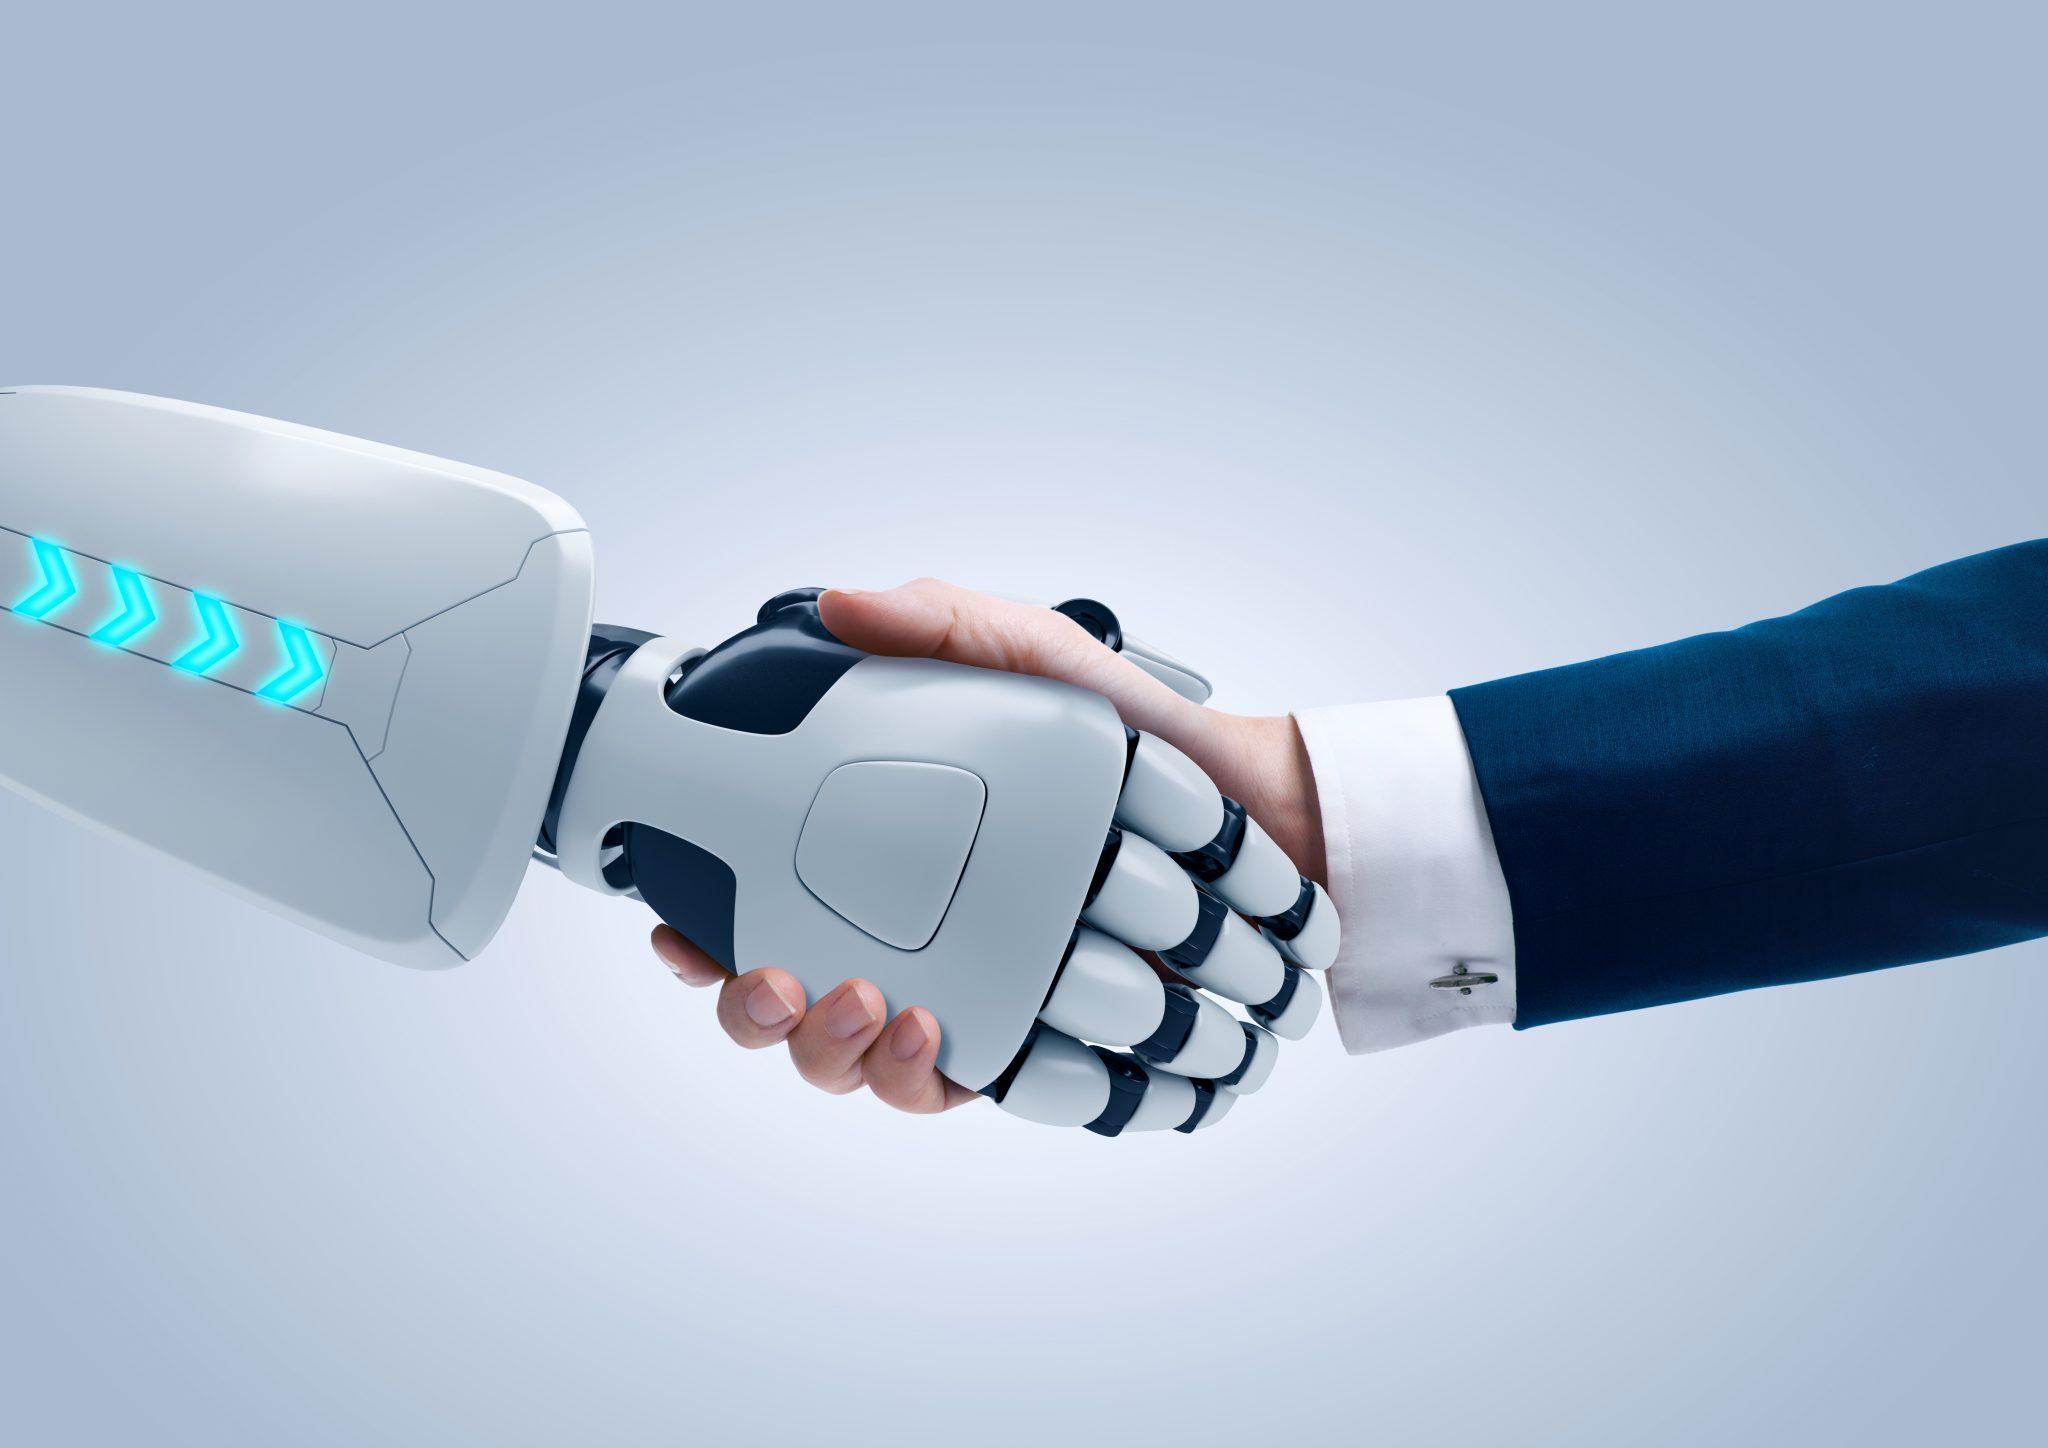 Robotic process automation: strategic or impulsive decision